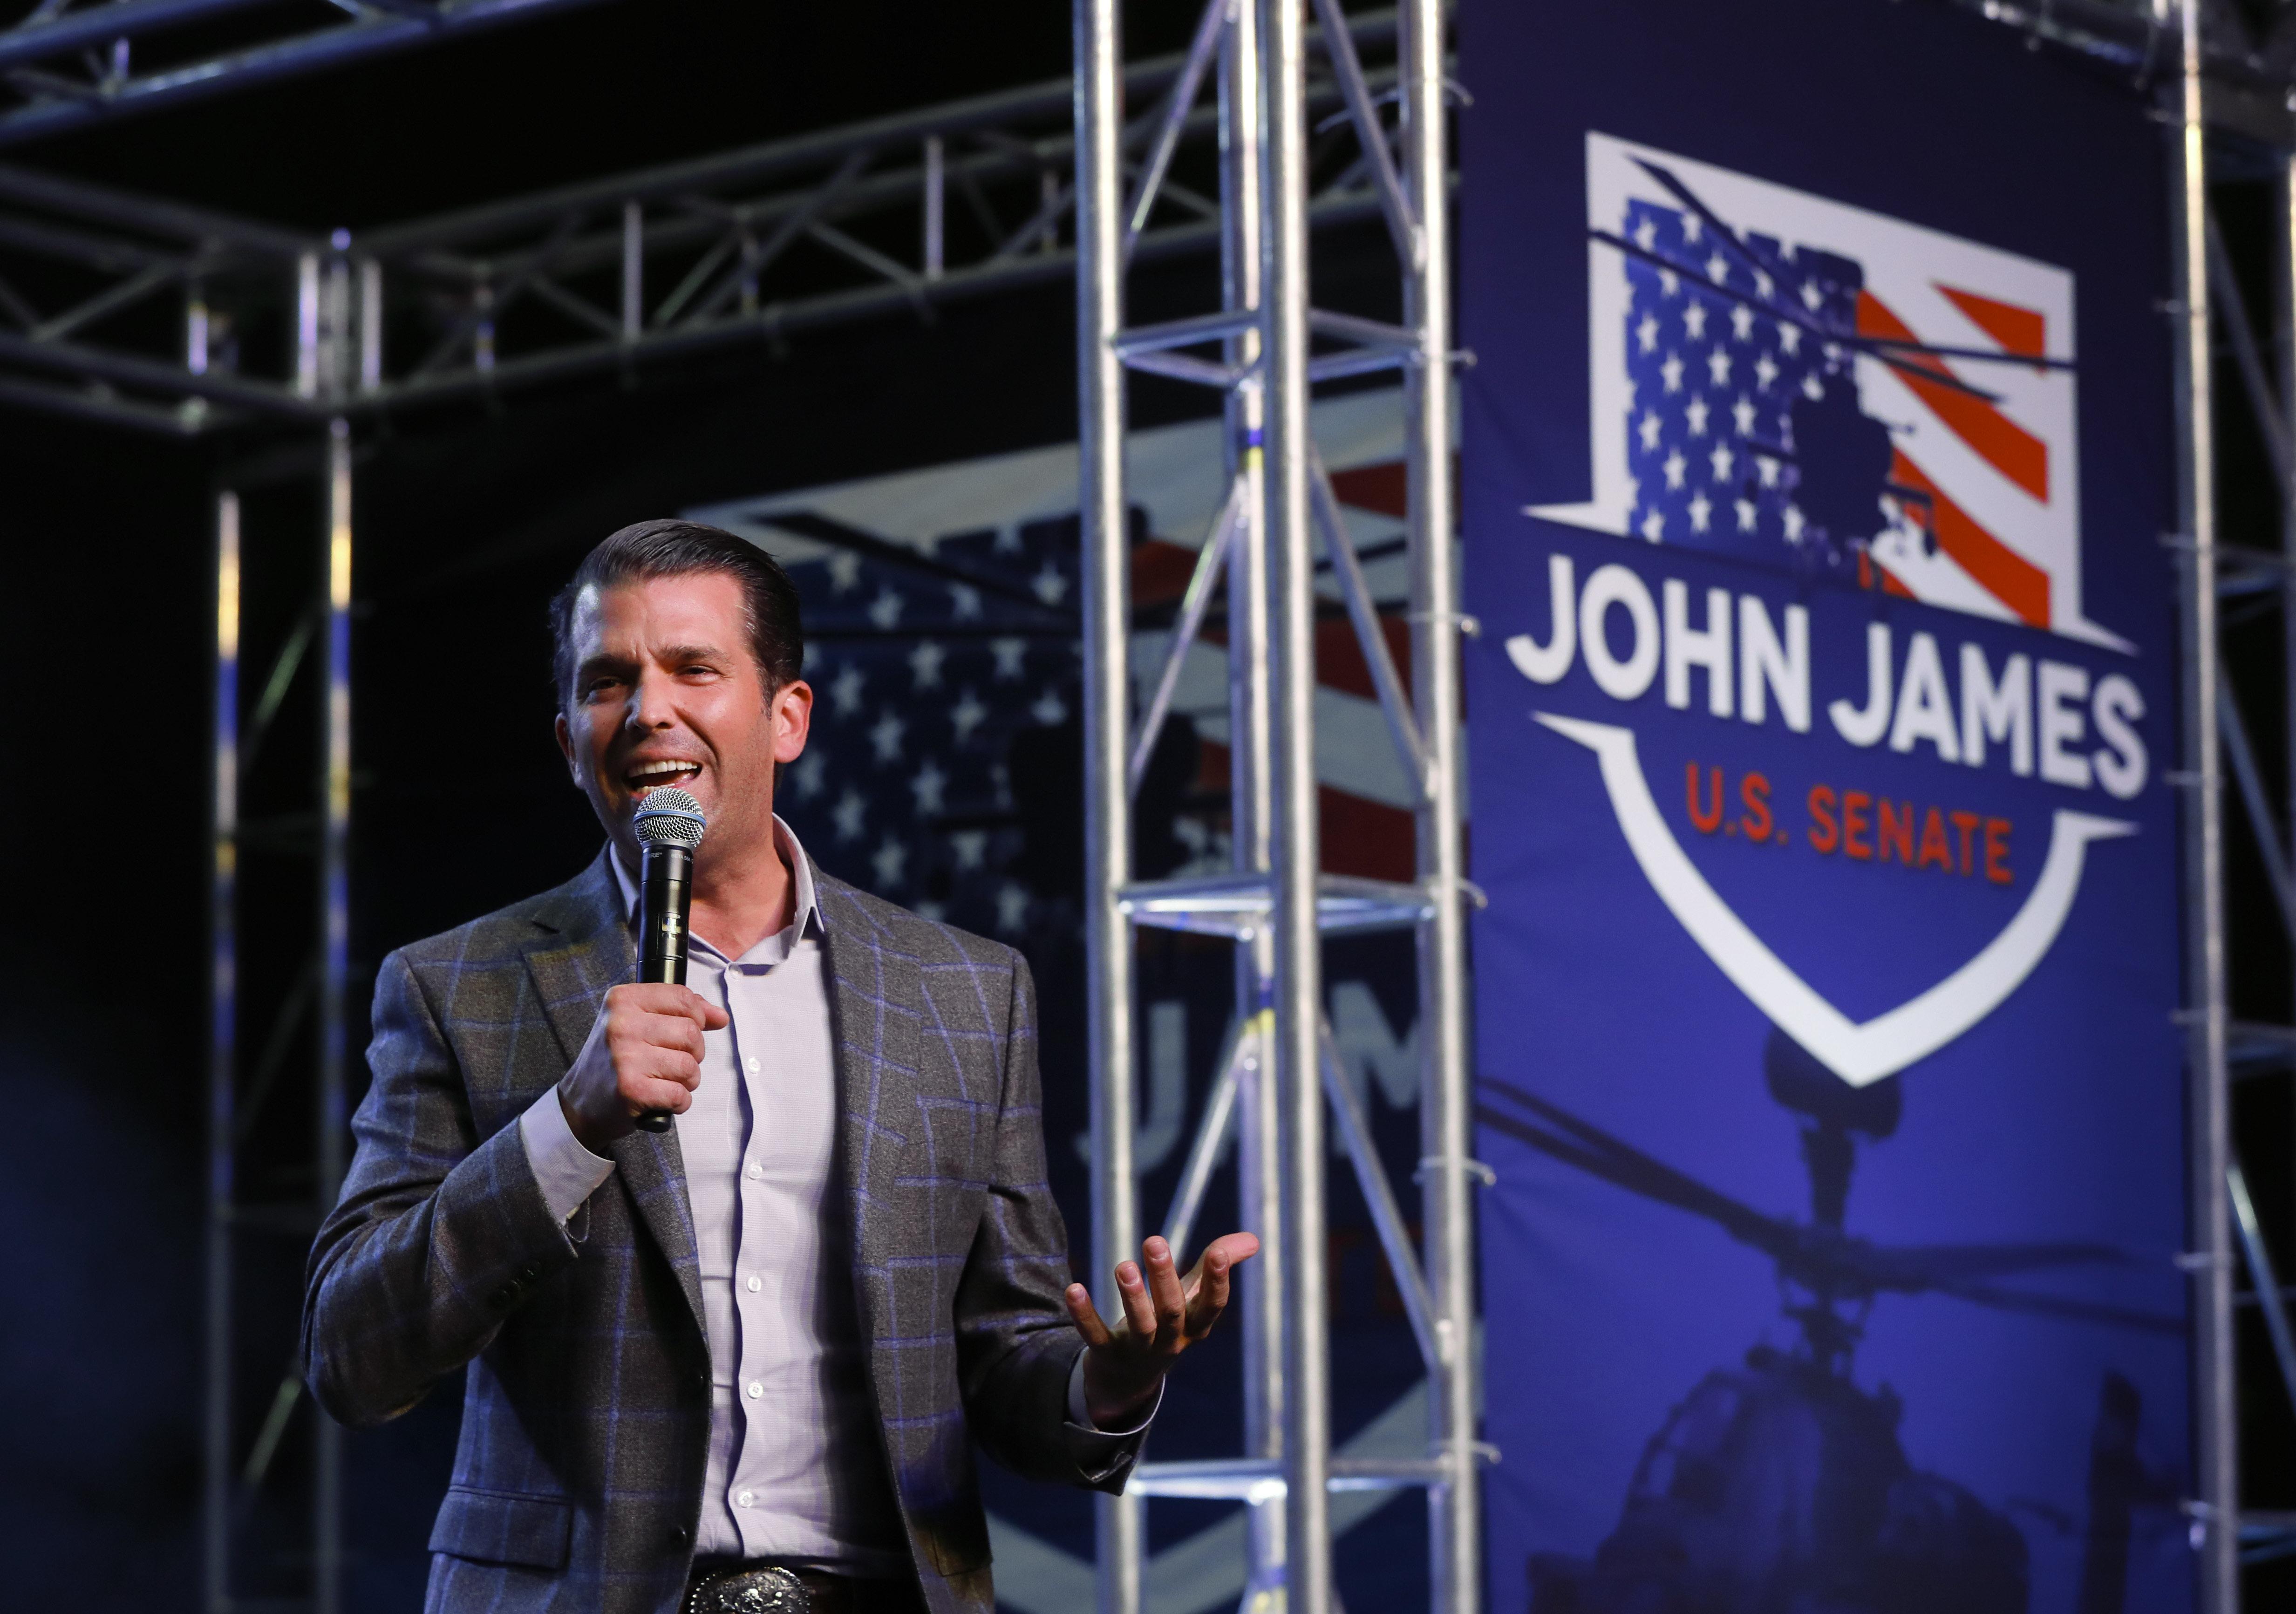 Donald Trump Jr. speaks during a rally for Republican U.S. Senate candidate John James in Pontiac, Mich., Wednesday, Oct. 17, 2018. (AP Photo/Paul Sancya)